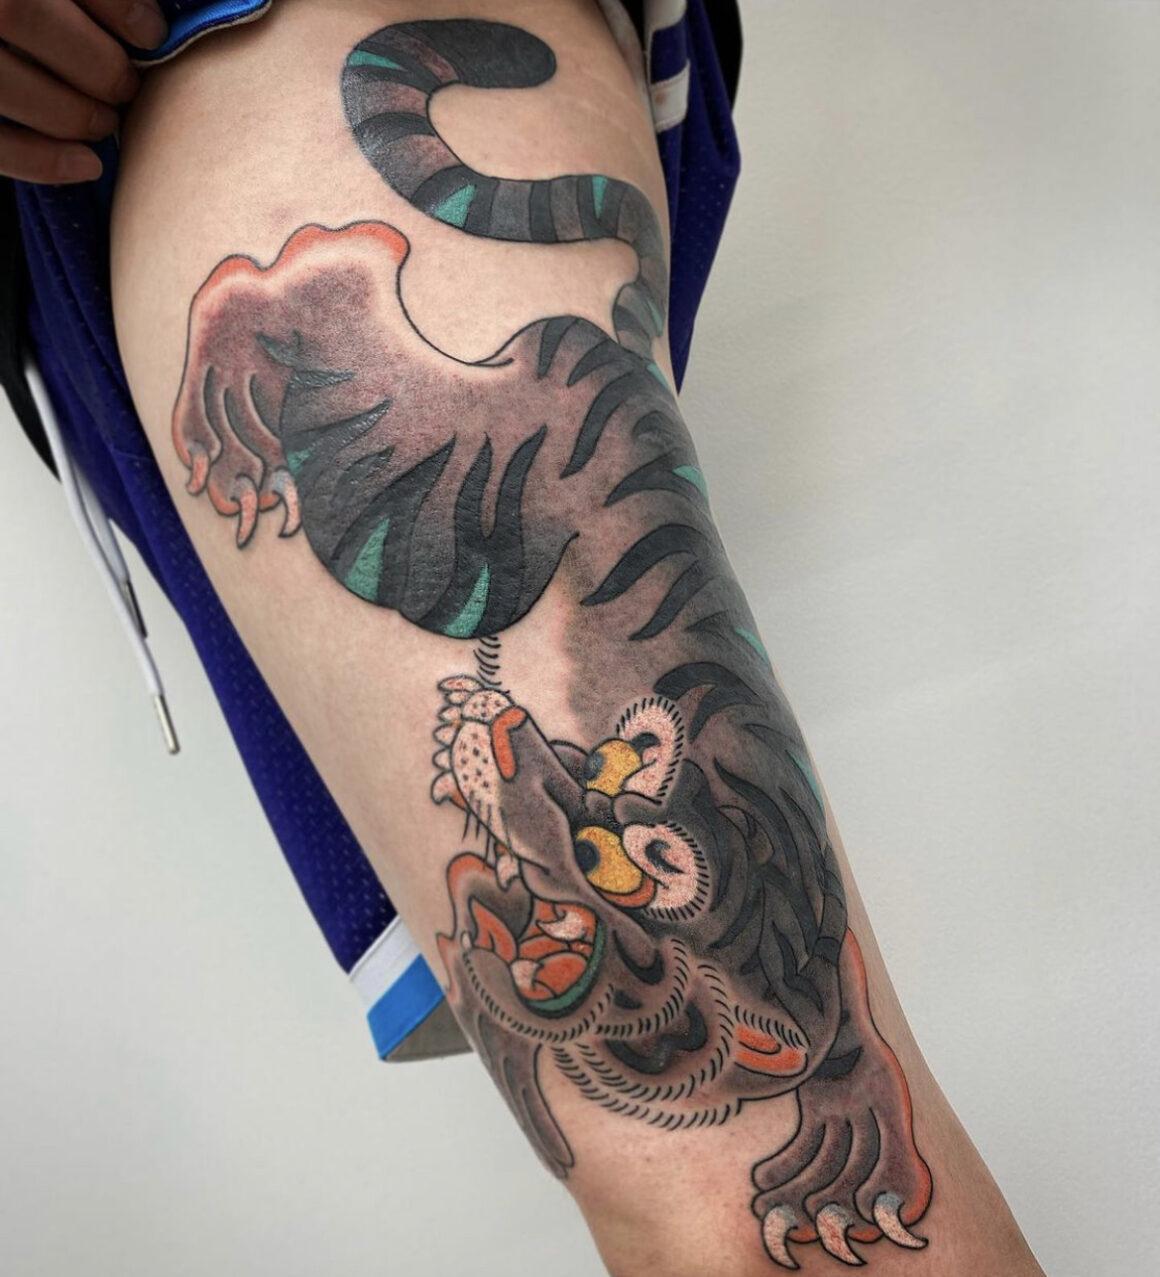 Horimatsu Bunshin, Sunset Tattoo, Auckland, New Zealand